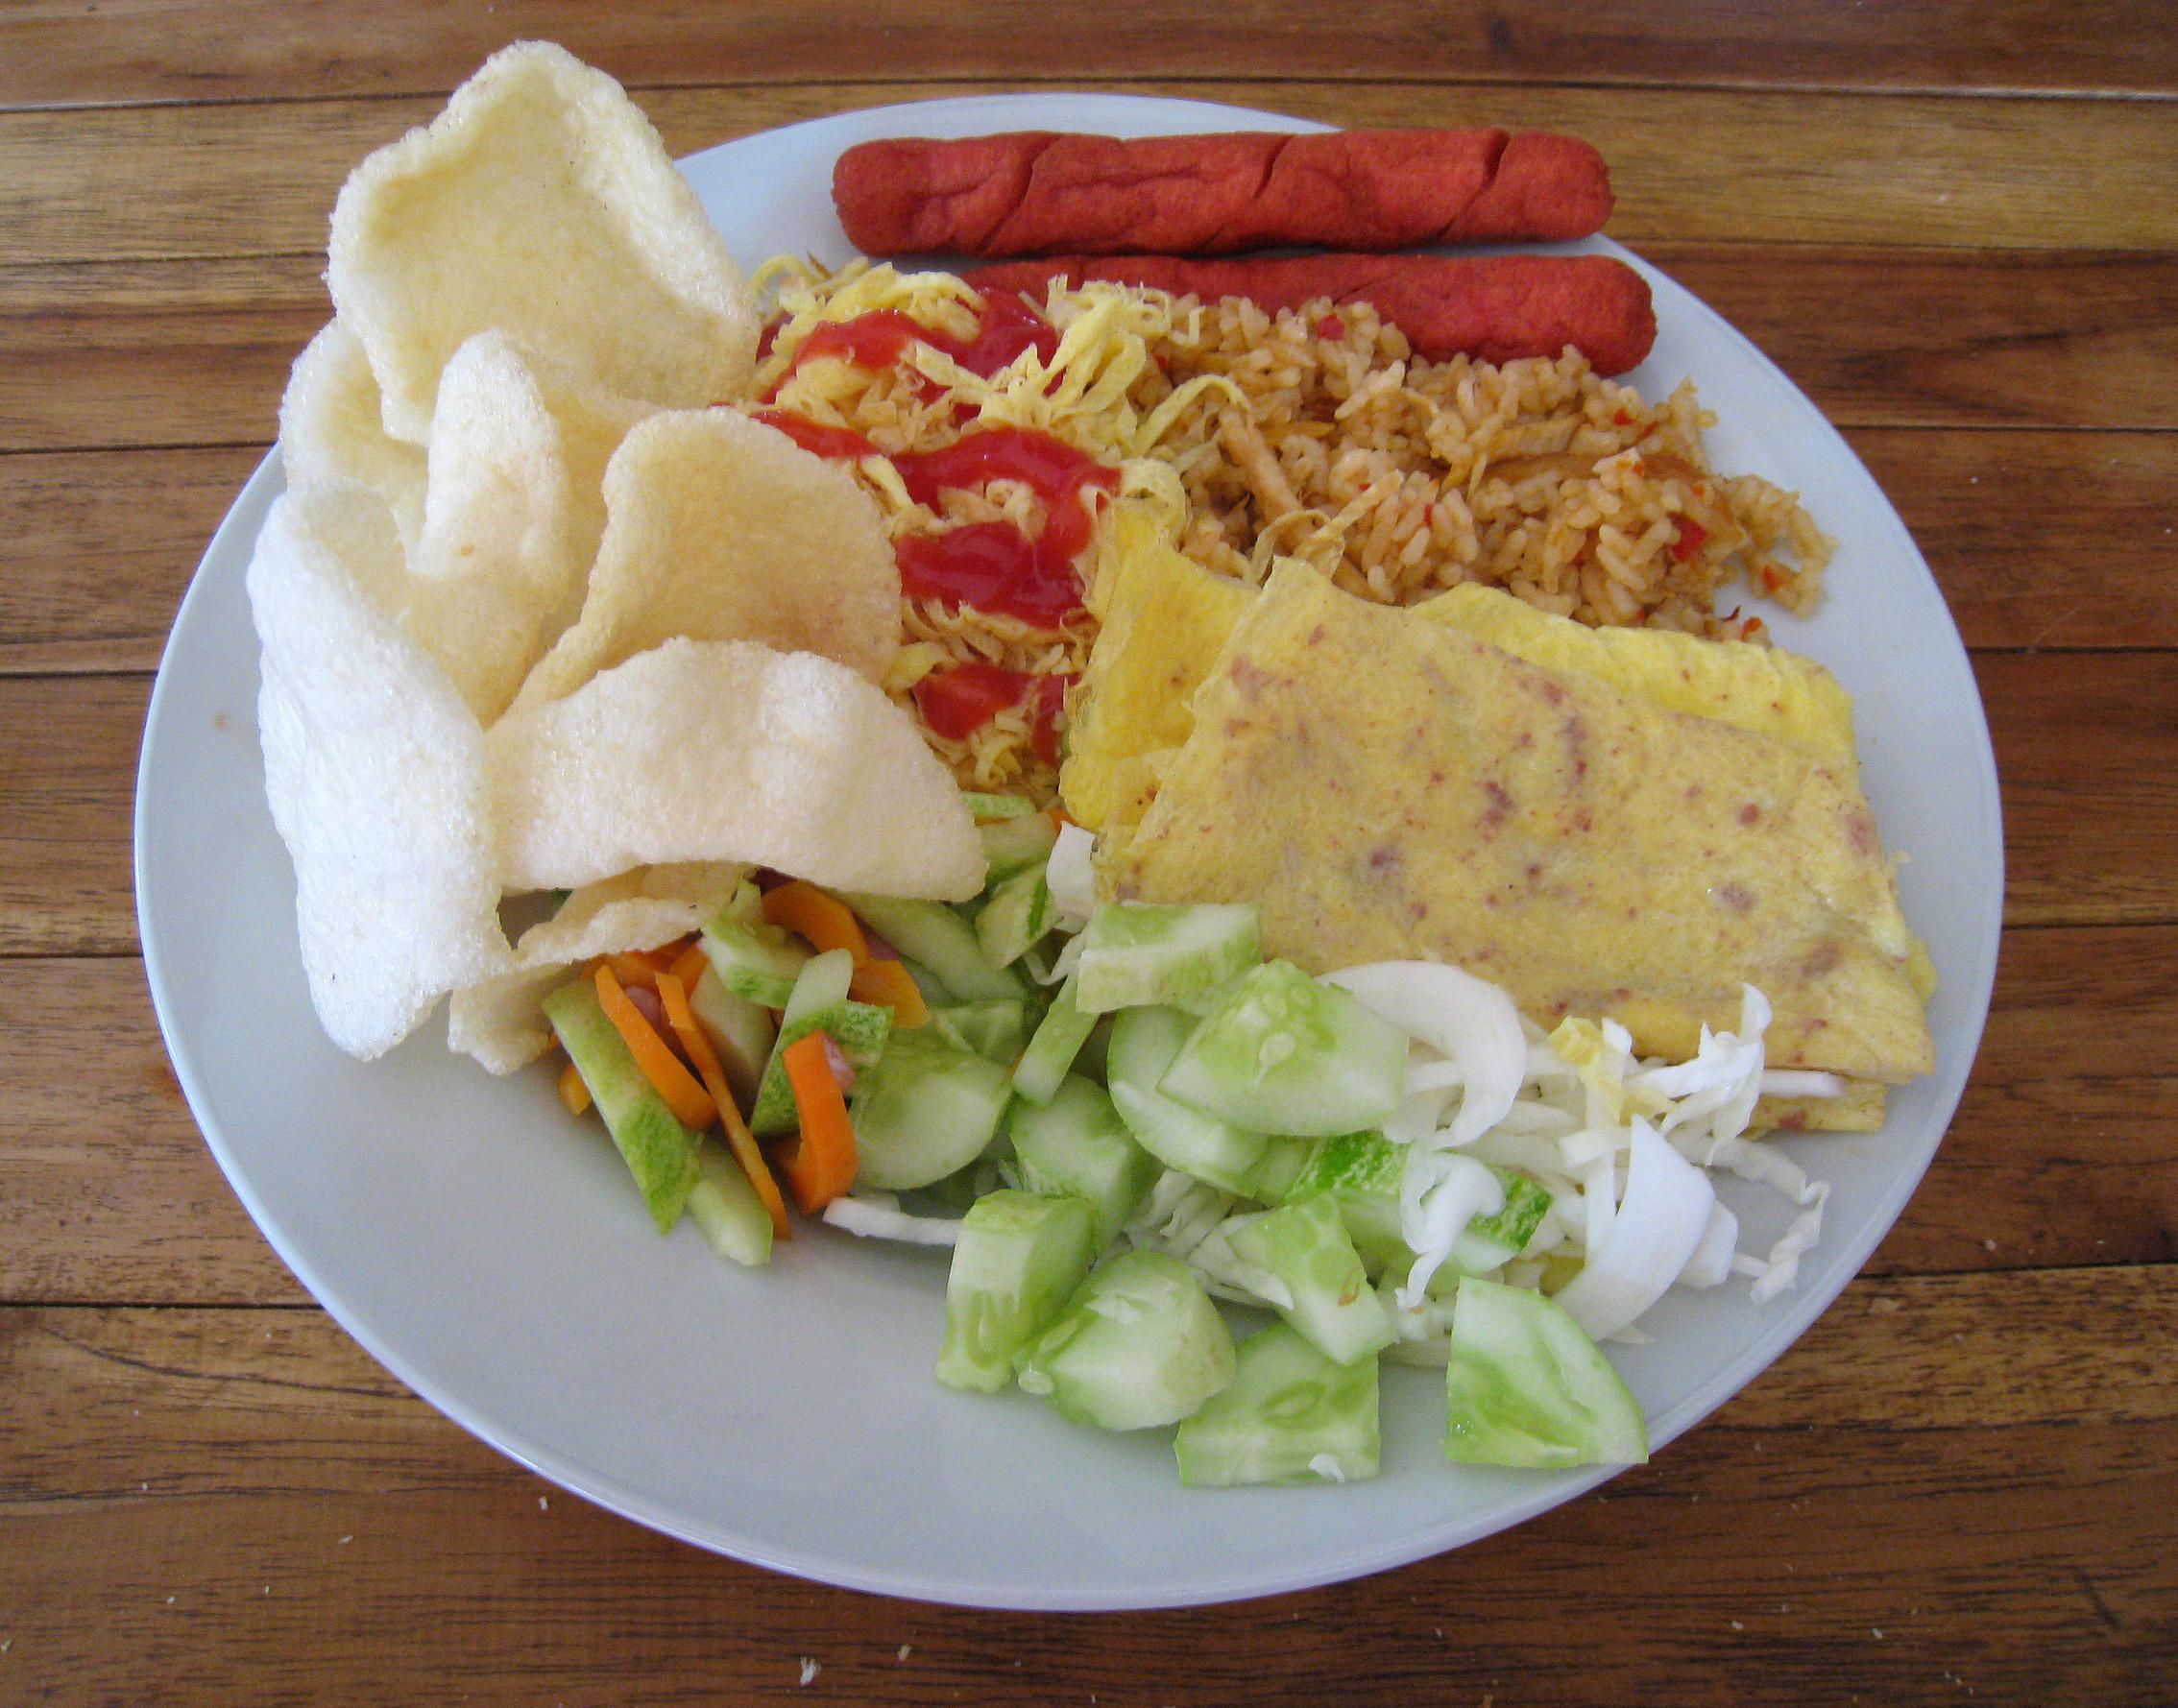 Ilustrasi variasi menu dari nasi goreng | Foto: wikimedia.org